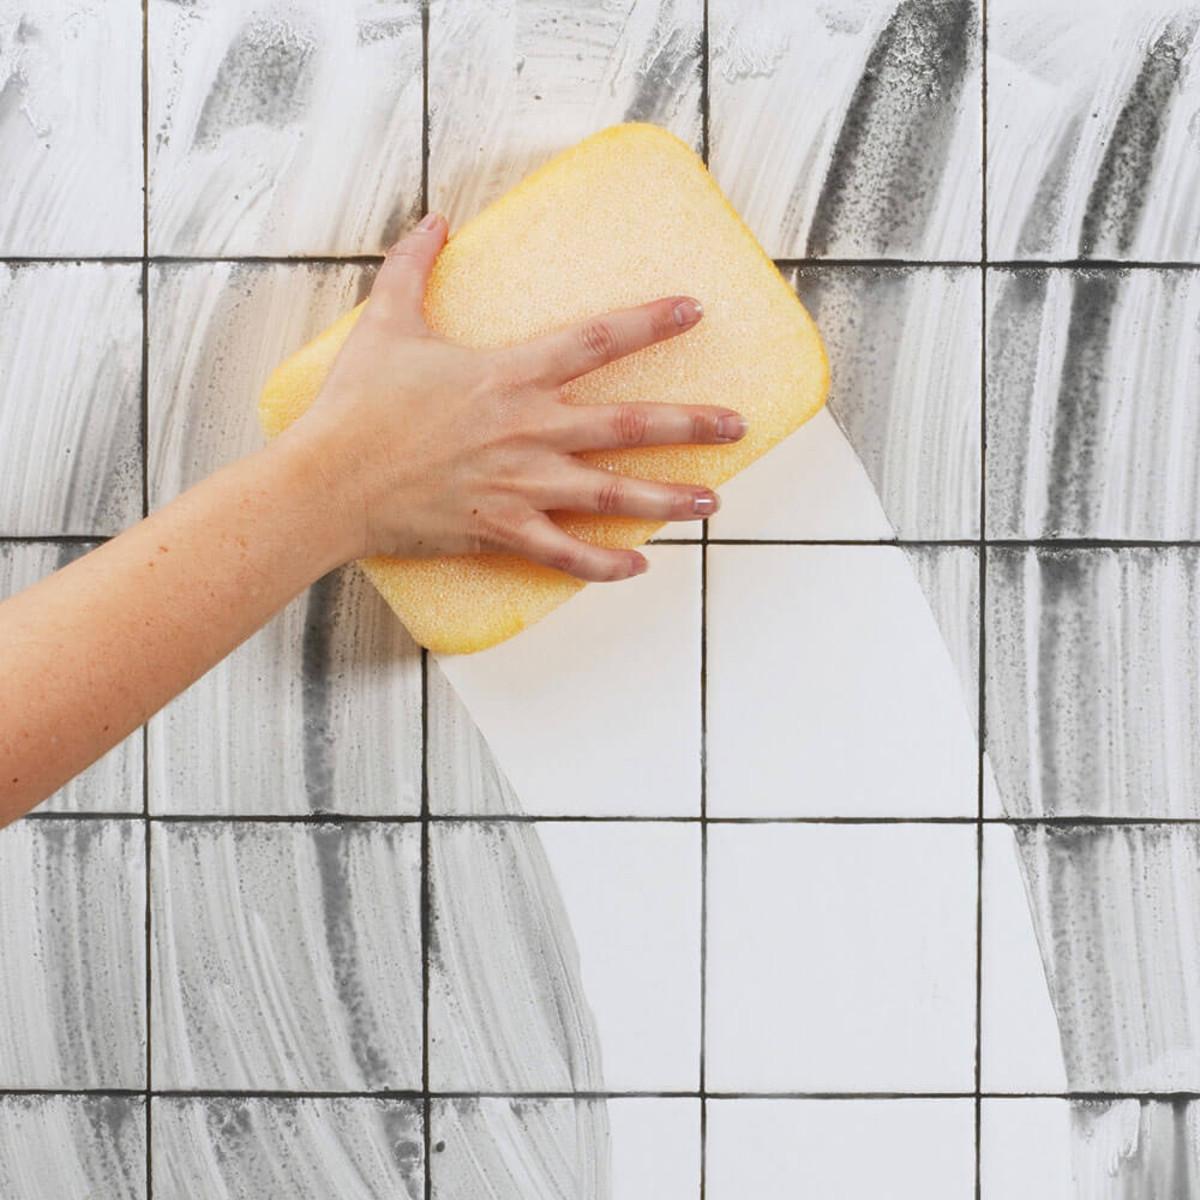 hydra tile grout scrub sponge